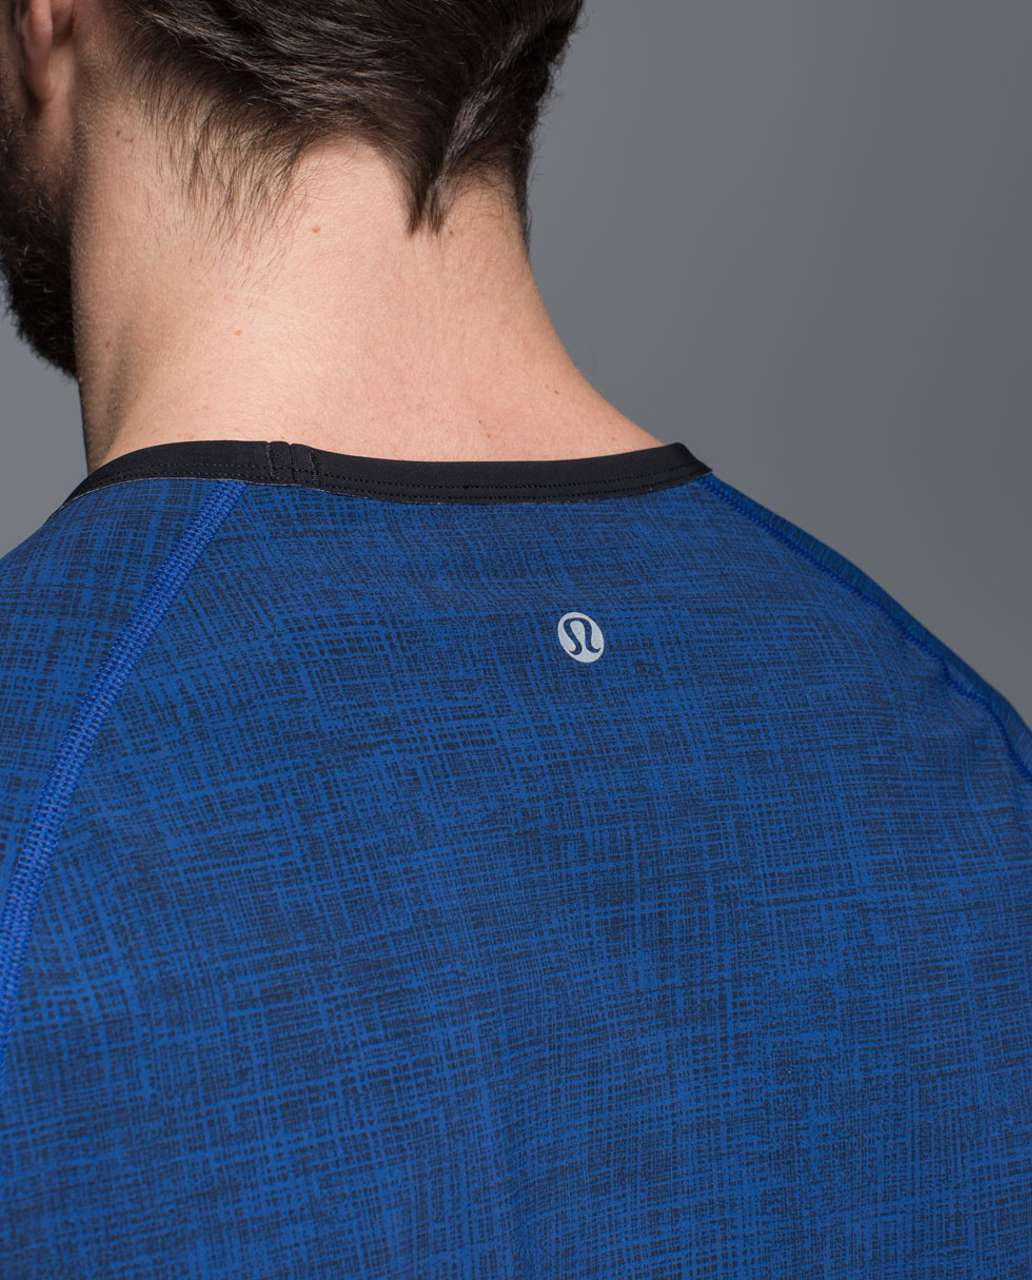 Lululemon Ocean Tech Short Sleeve - Scratch That Texture More Cove / Black